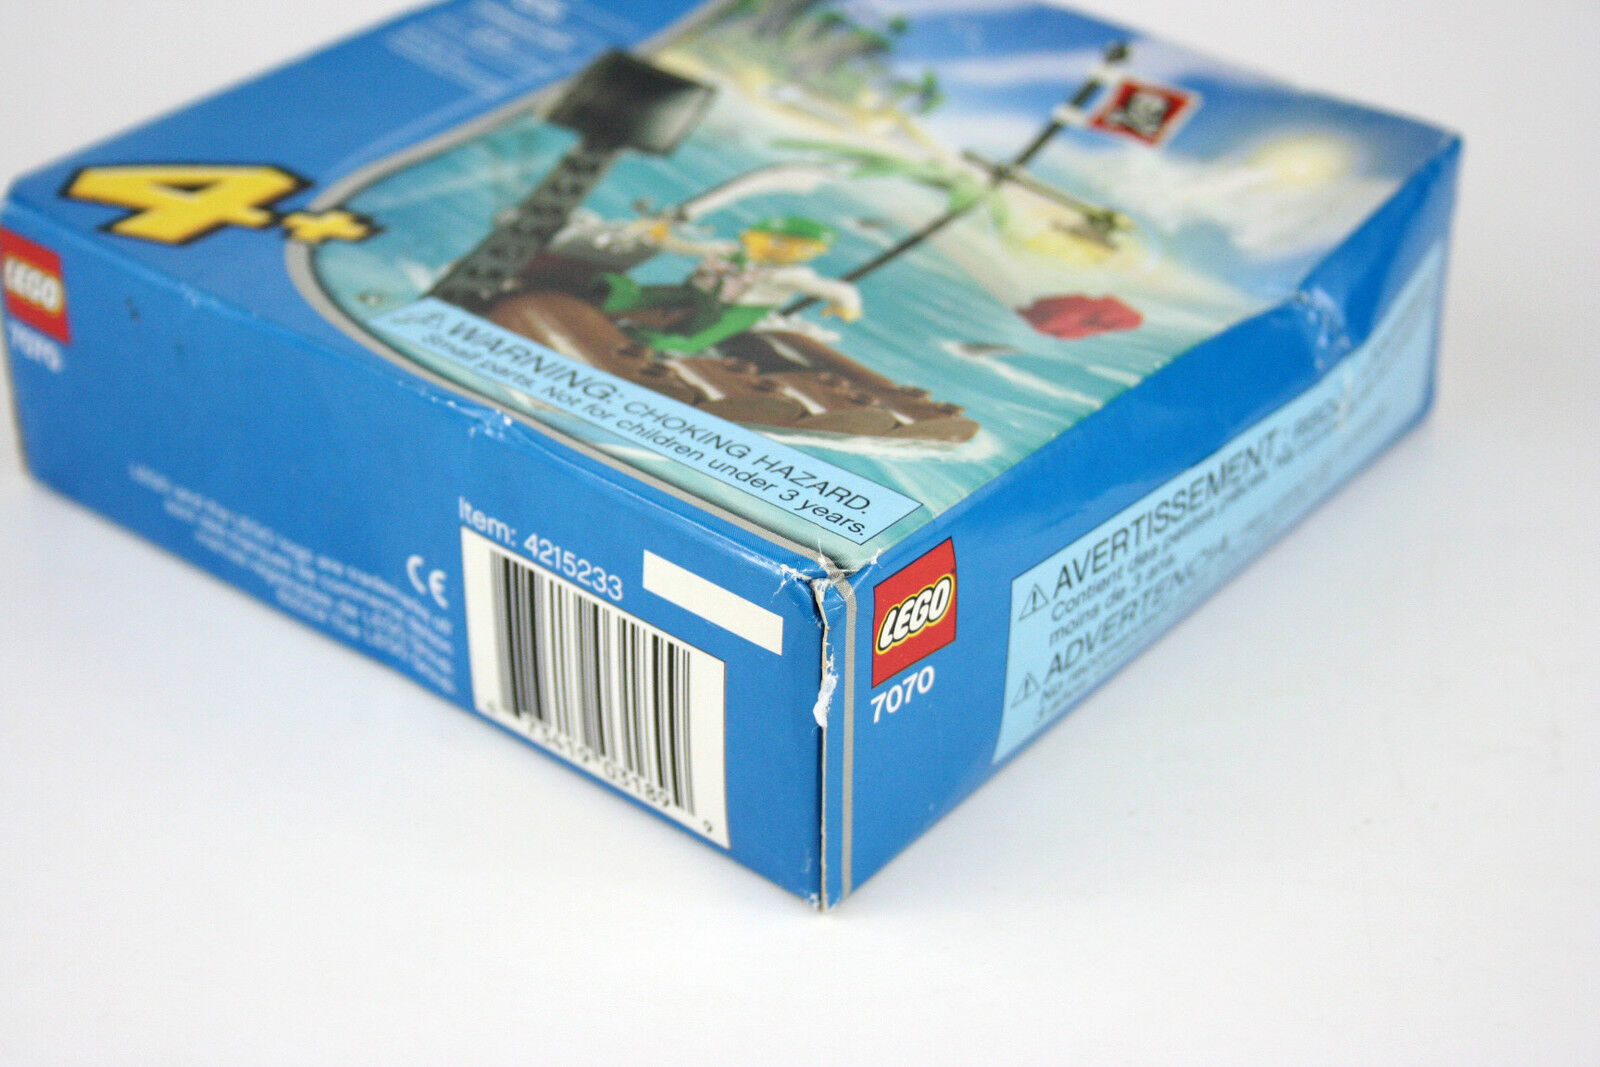 Lego 7070 Catapult Raft Raft Raft Pirate 23 pcs Building Toy 2004 - New Sealed 5d77cf